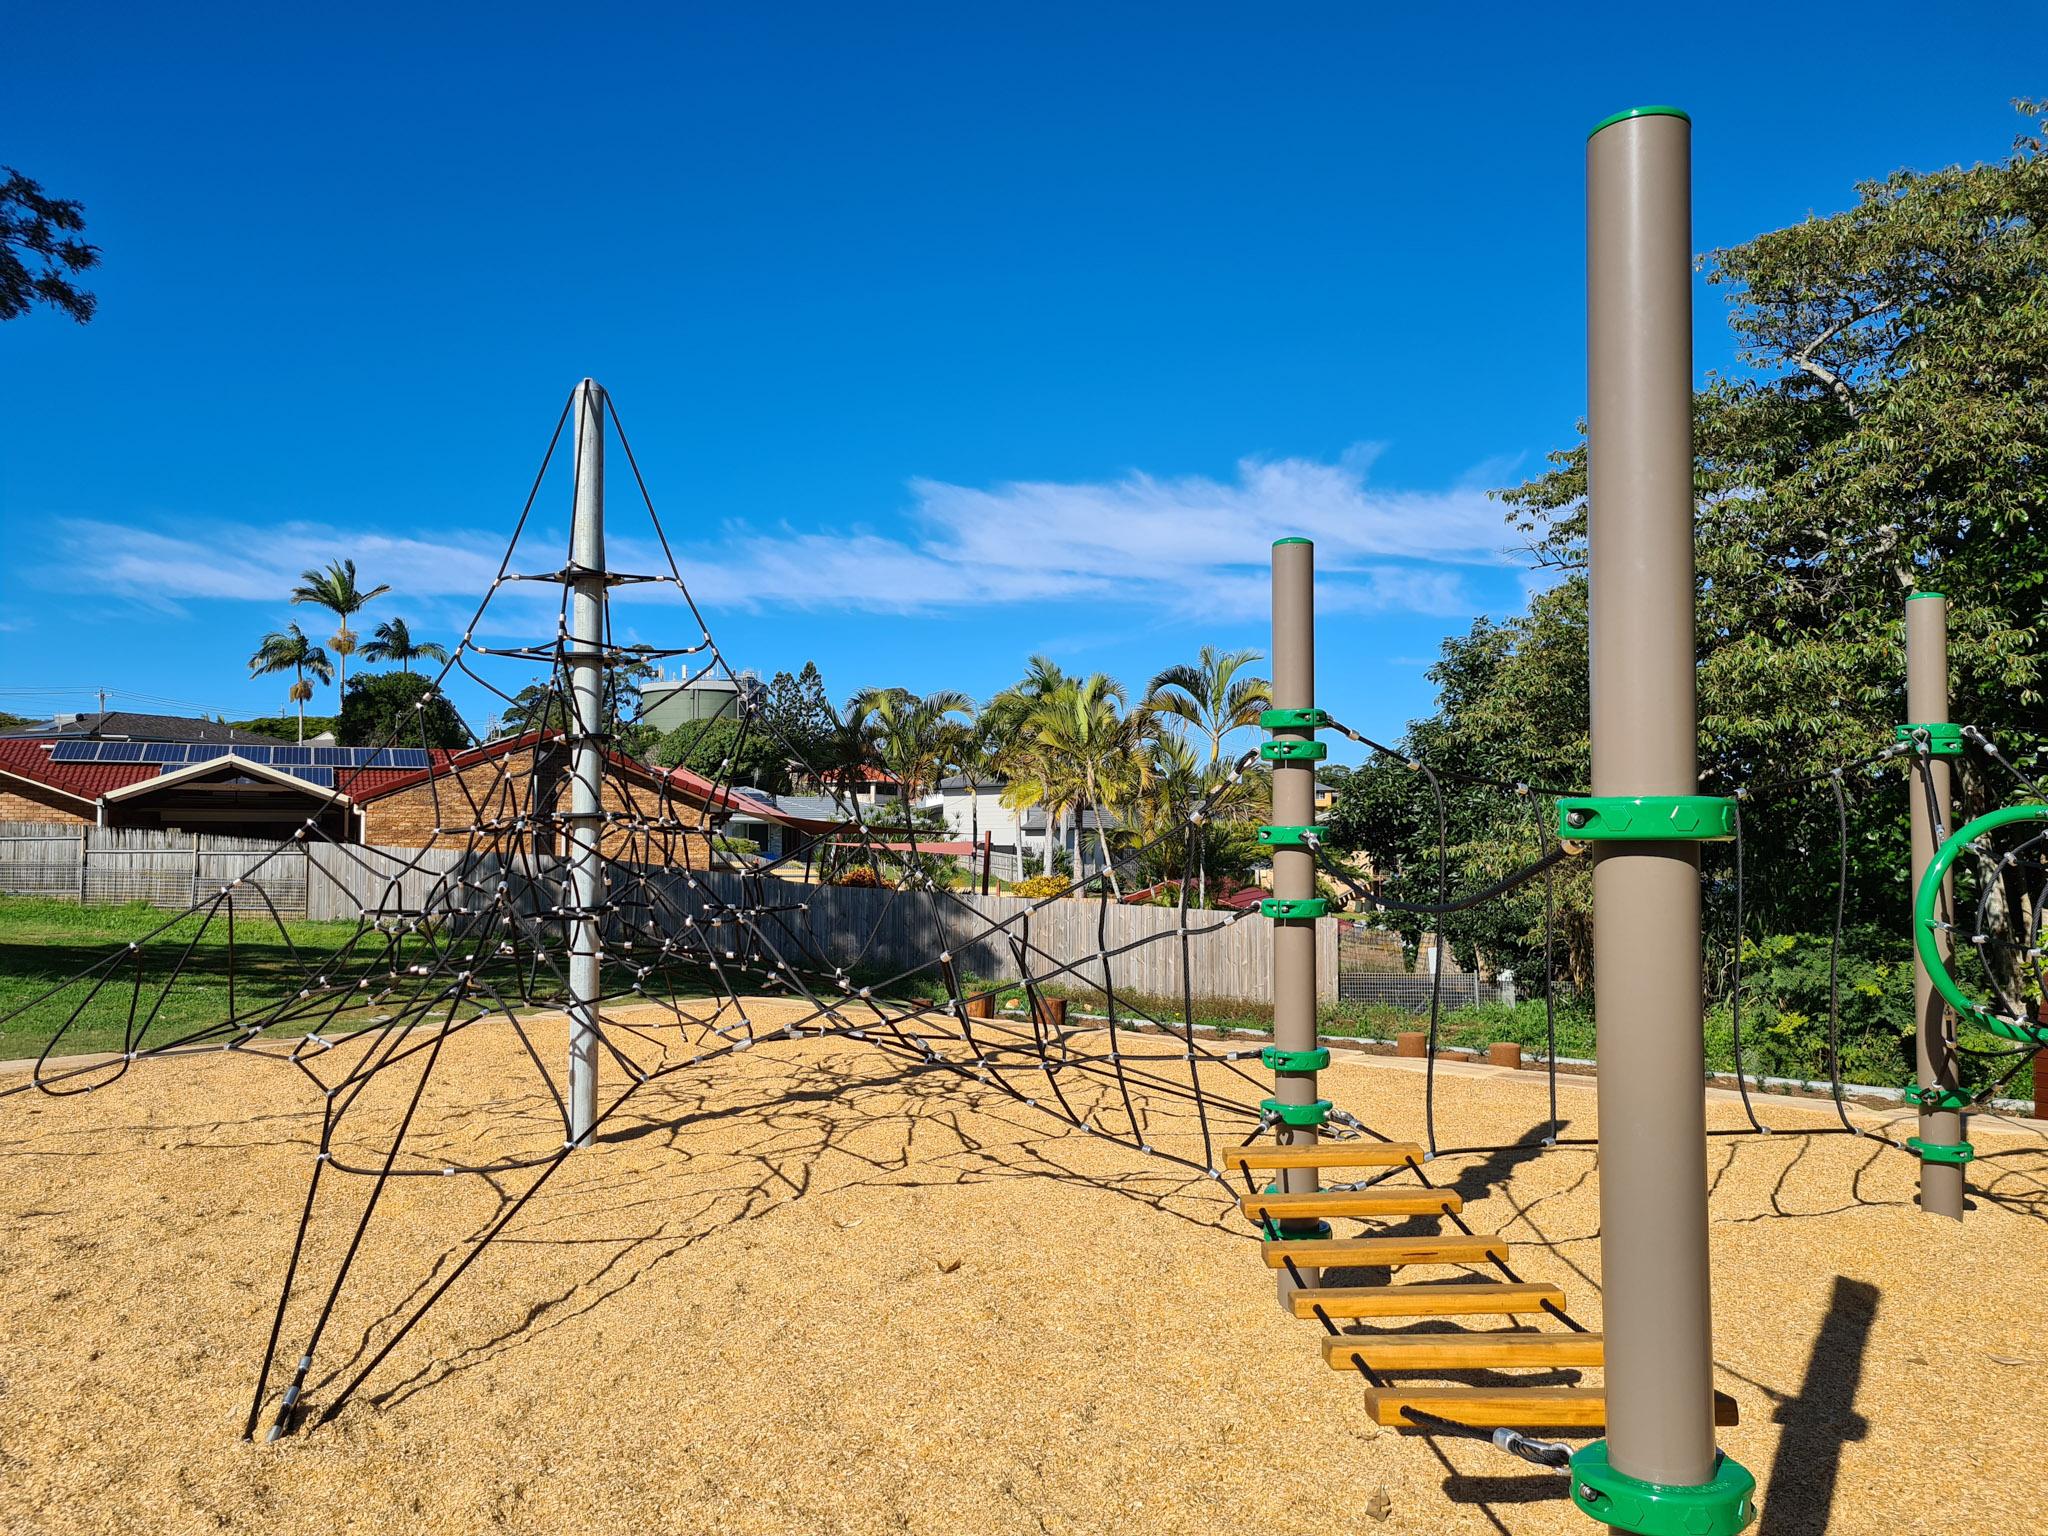 palm-beach-state-school-playrground-austek-play-44